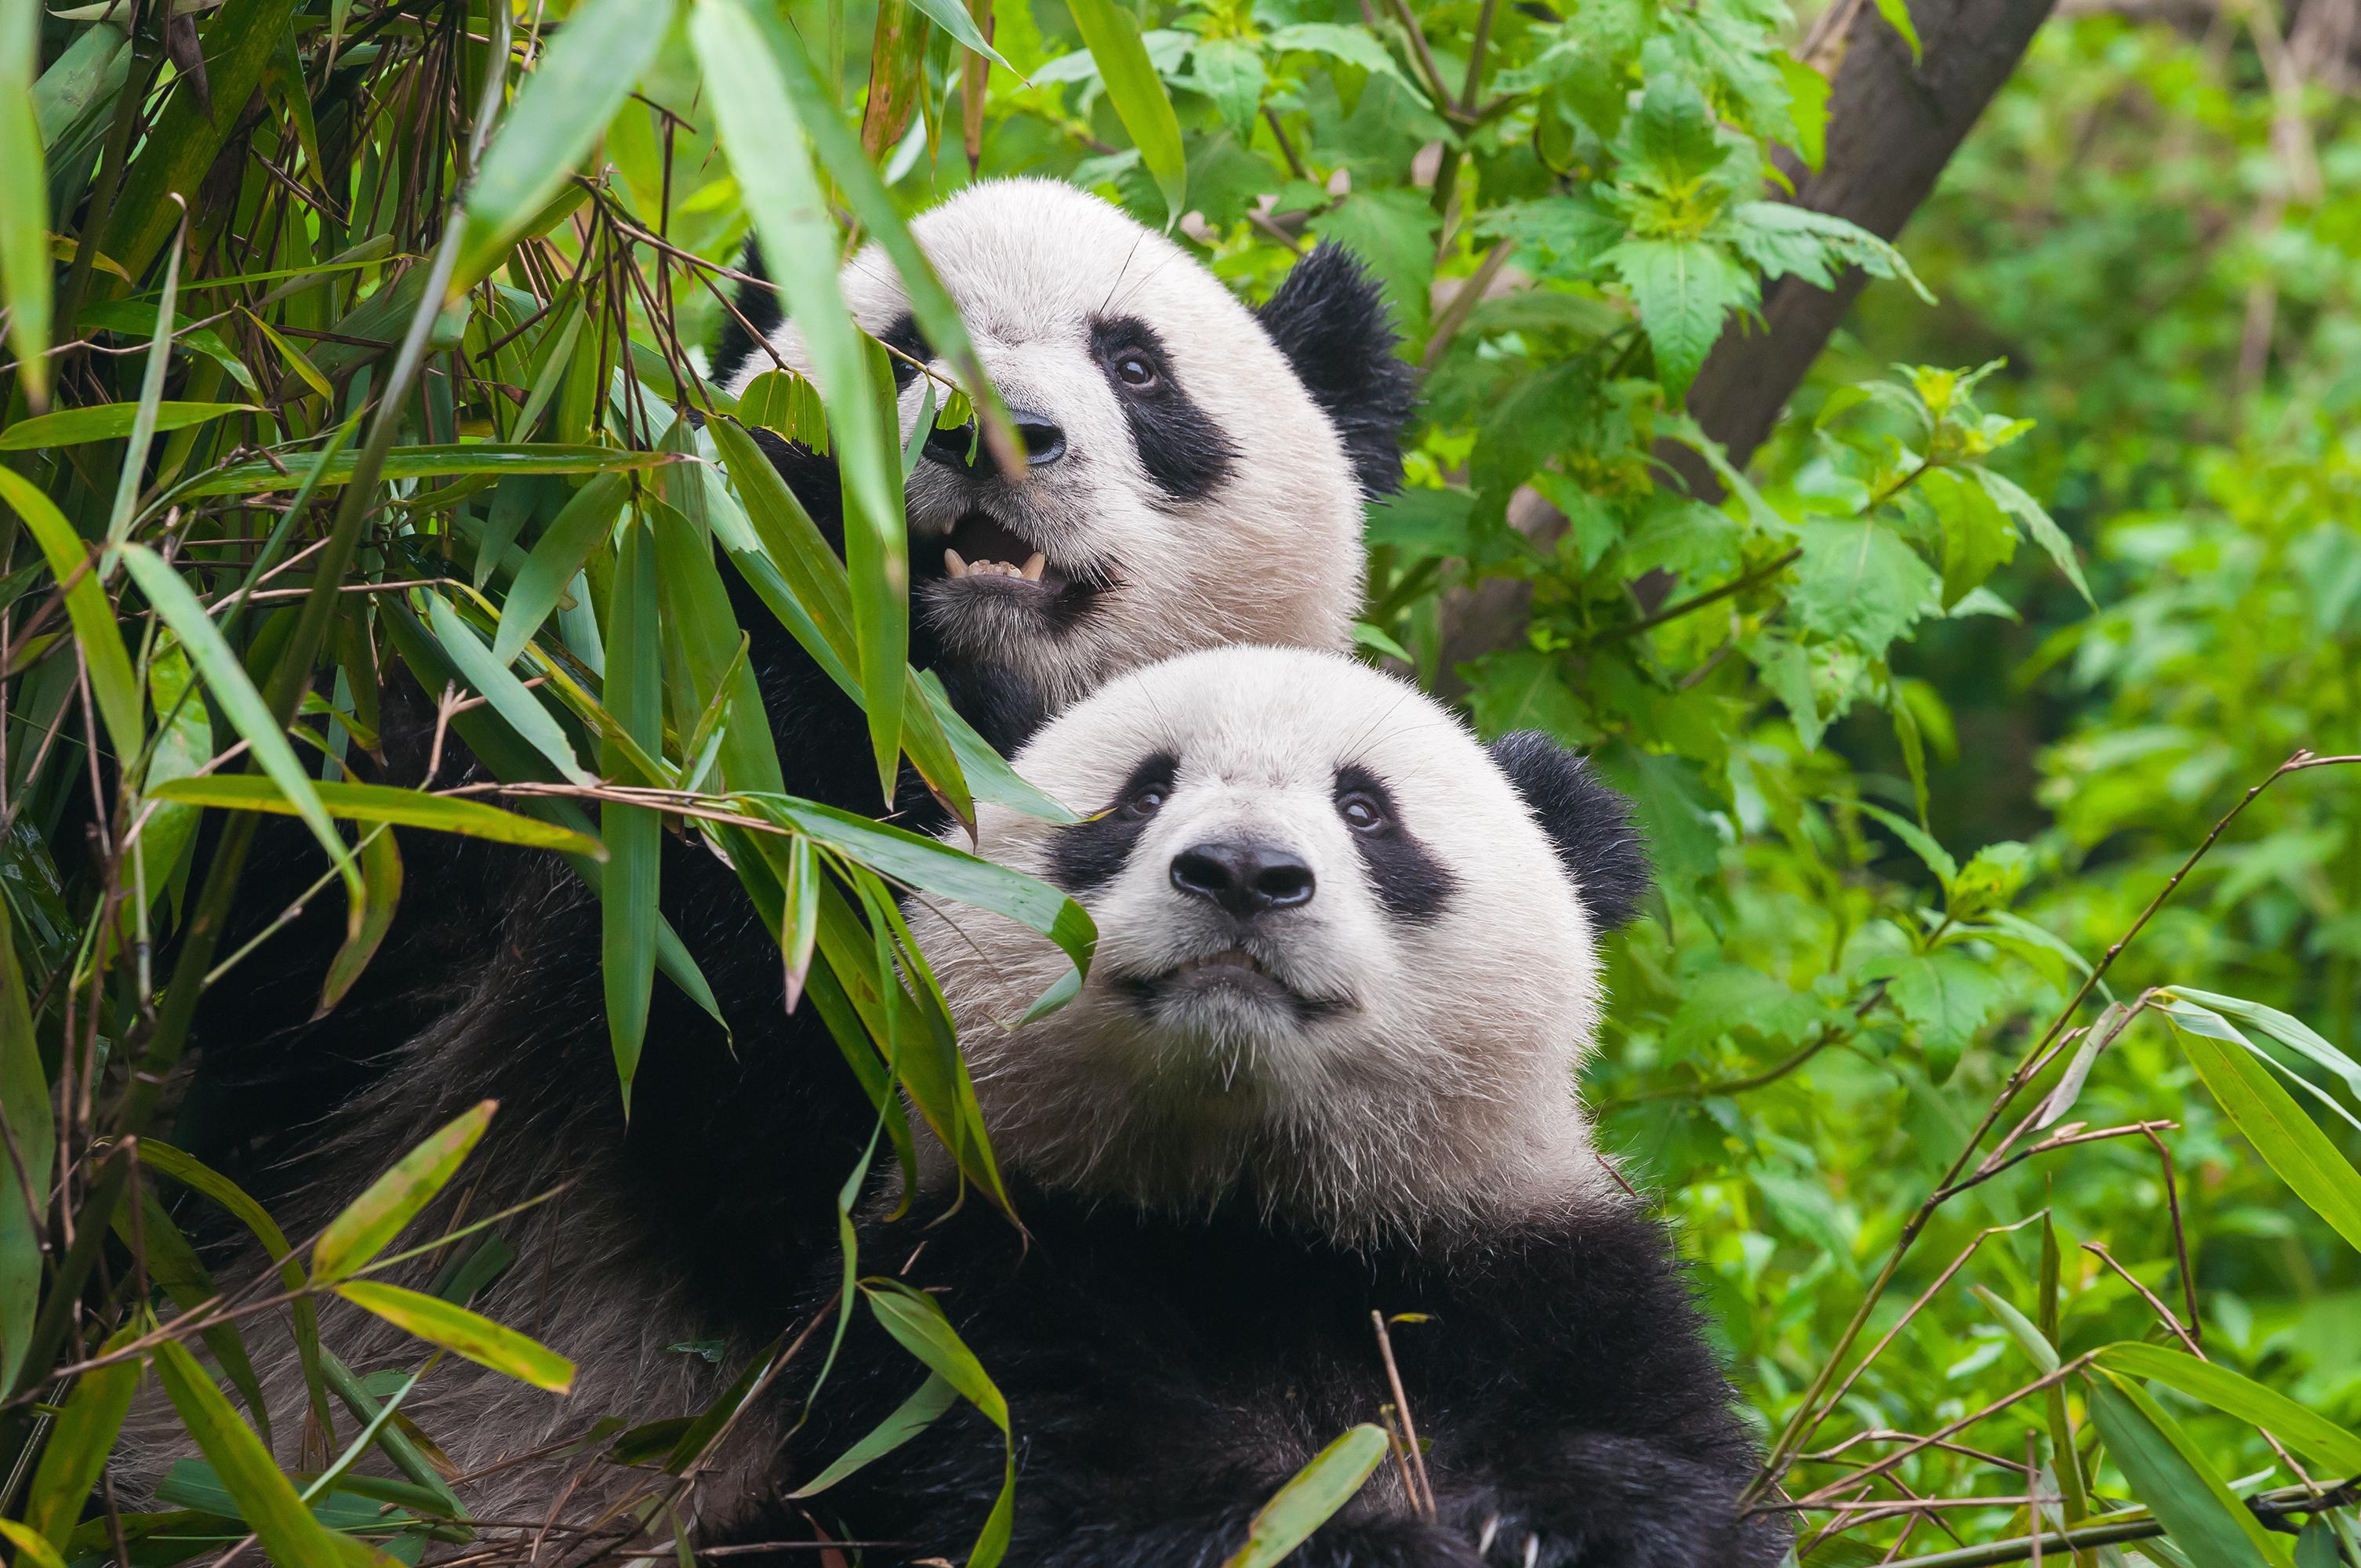 How to Save Endangered Pandas